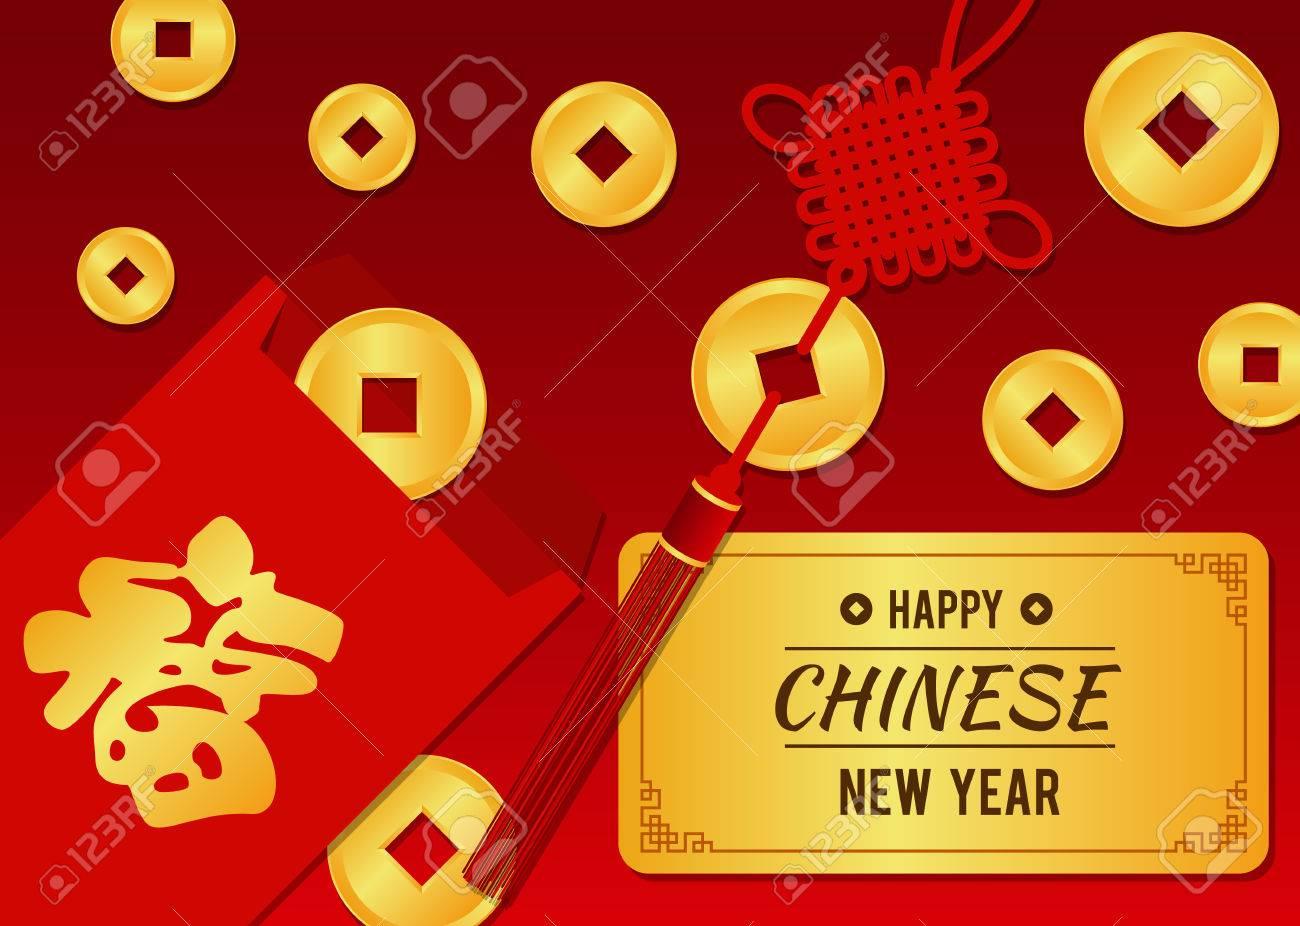 Happy chinese new year card chinese angpao and gold coin happy chinese new year card chinese angpao and gold coin chinese word mean blessing kristyandbryce Choice Image